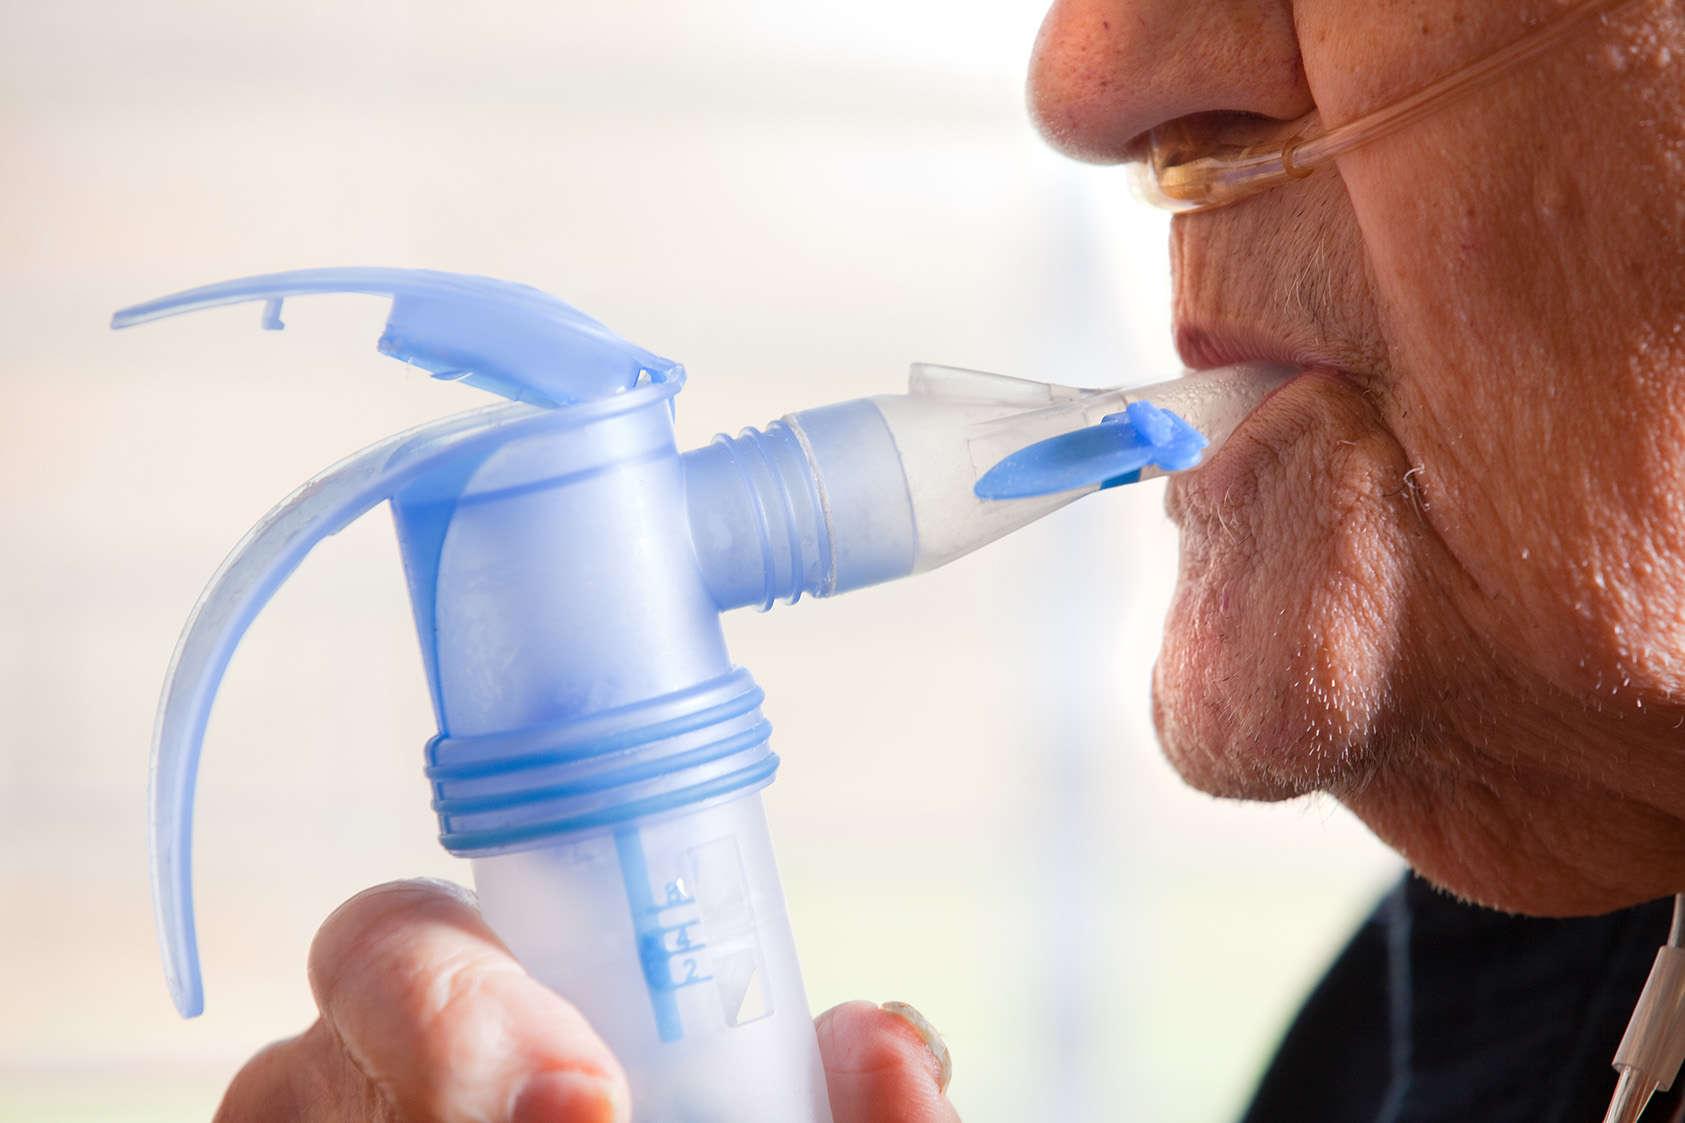 Close Up Of Elderly Man Using Nebulizer